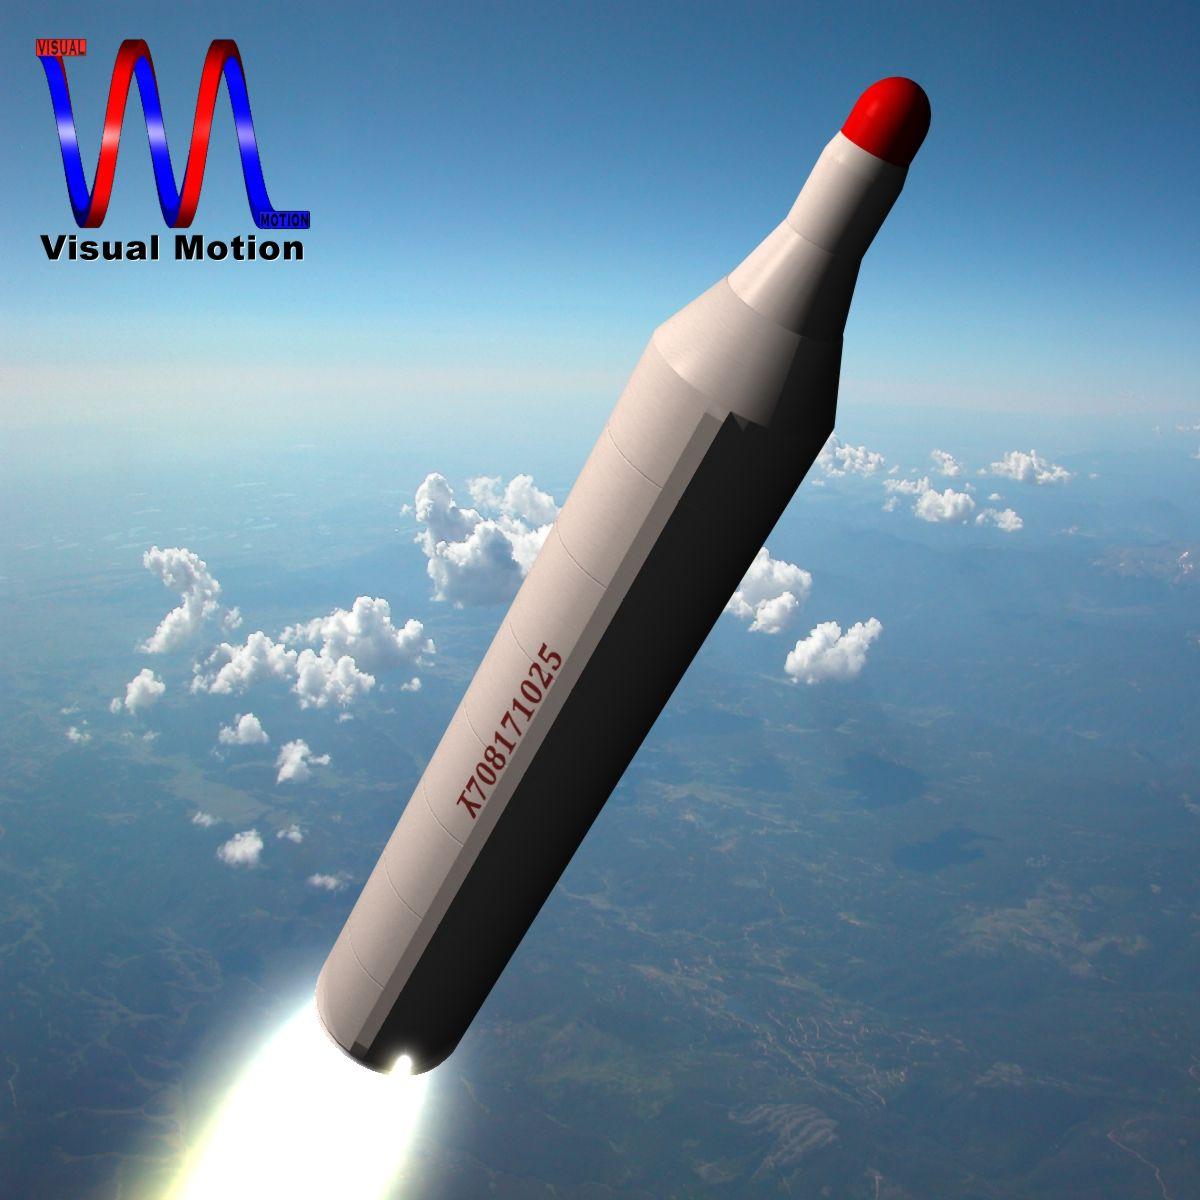 dprk bm25 musudan raketa 3d model 3ds dxf x cod scn obj 149588